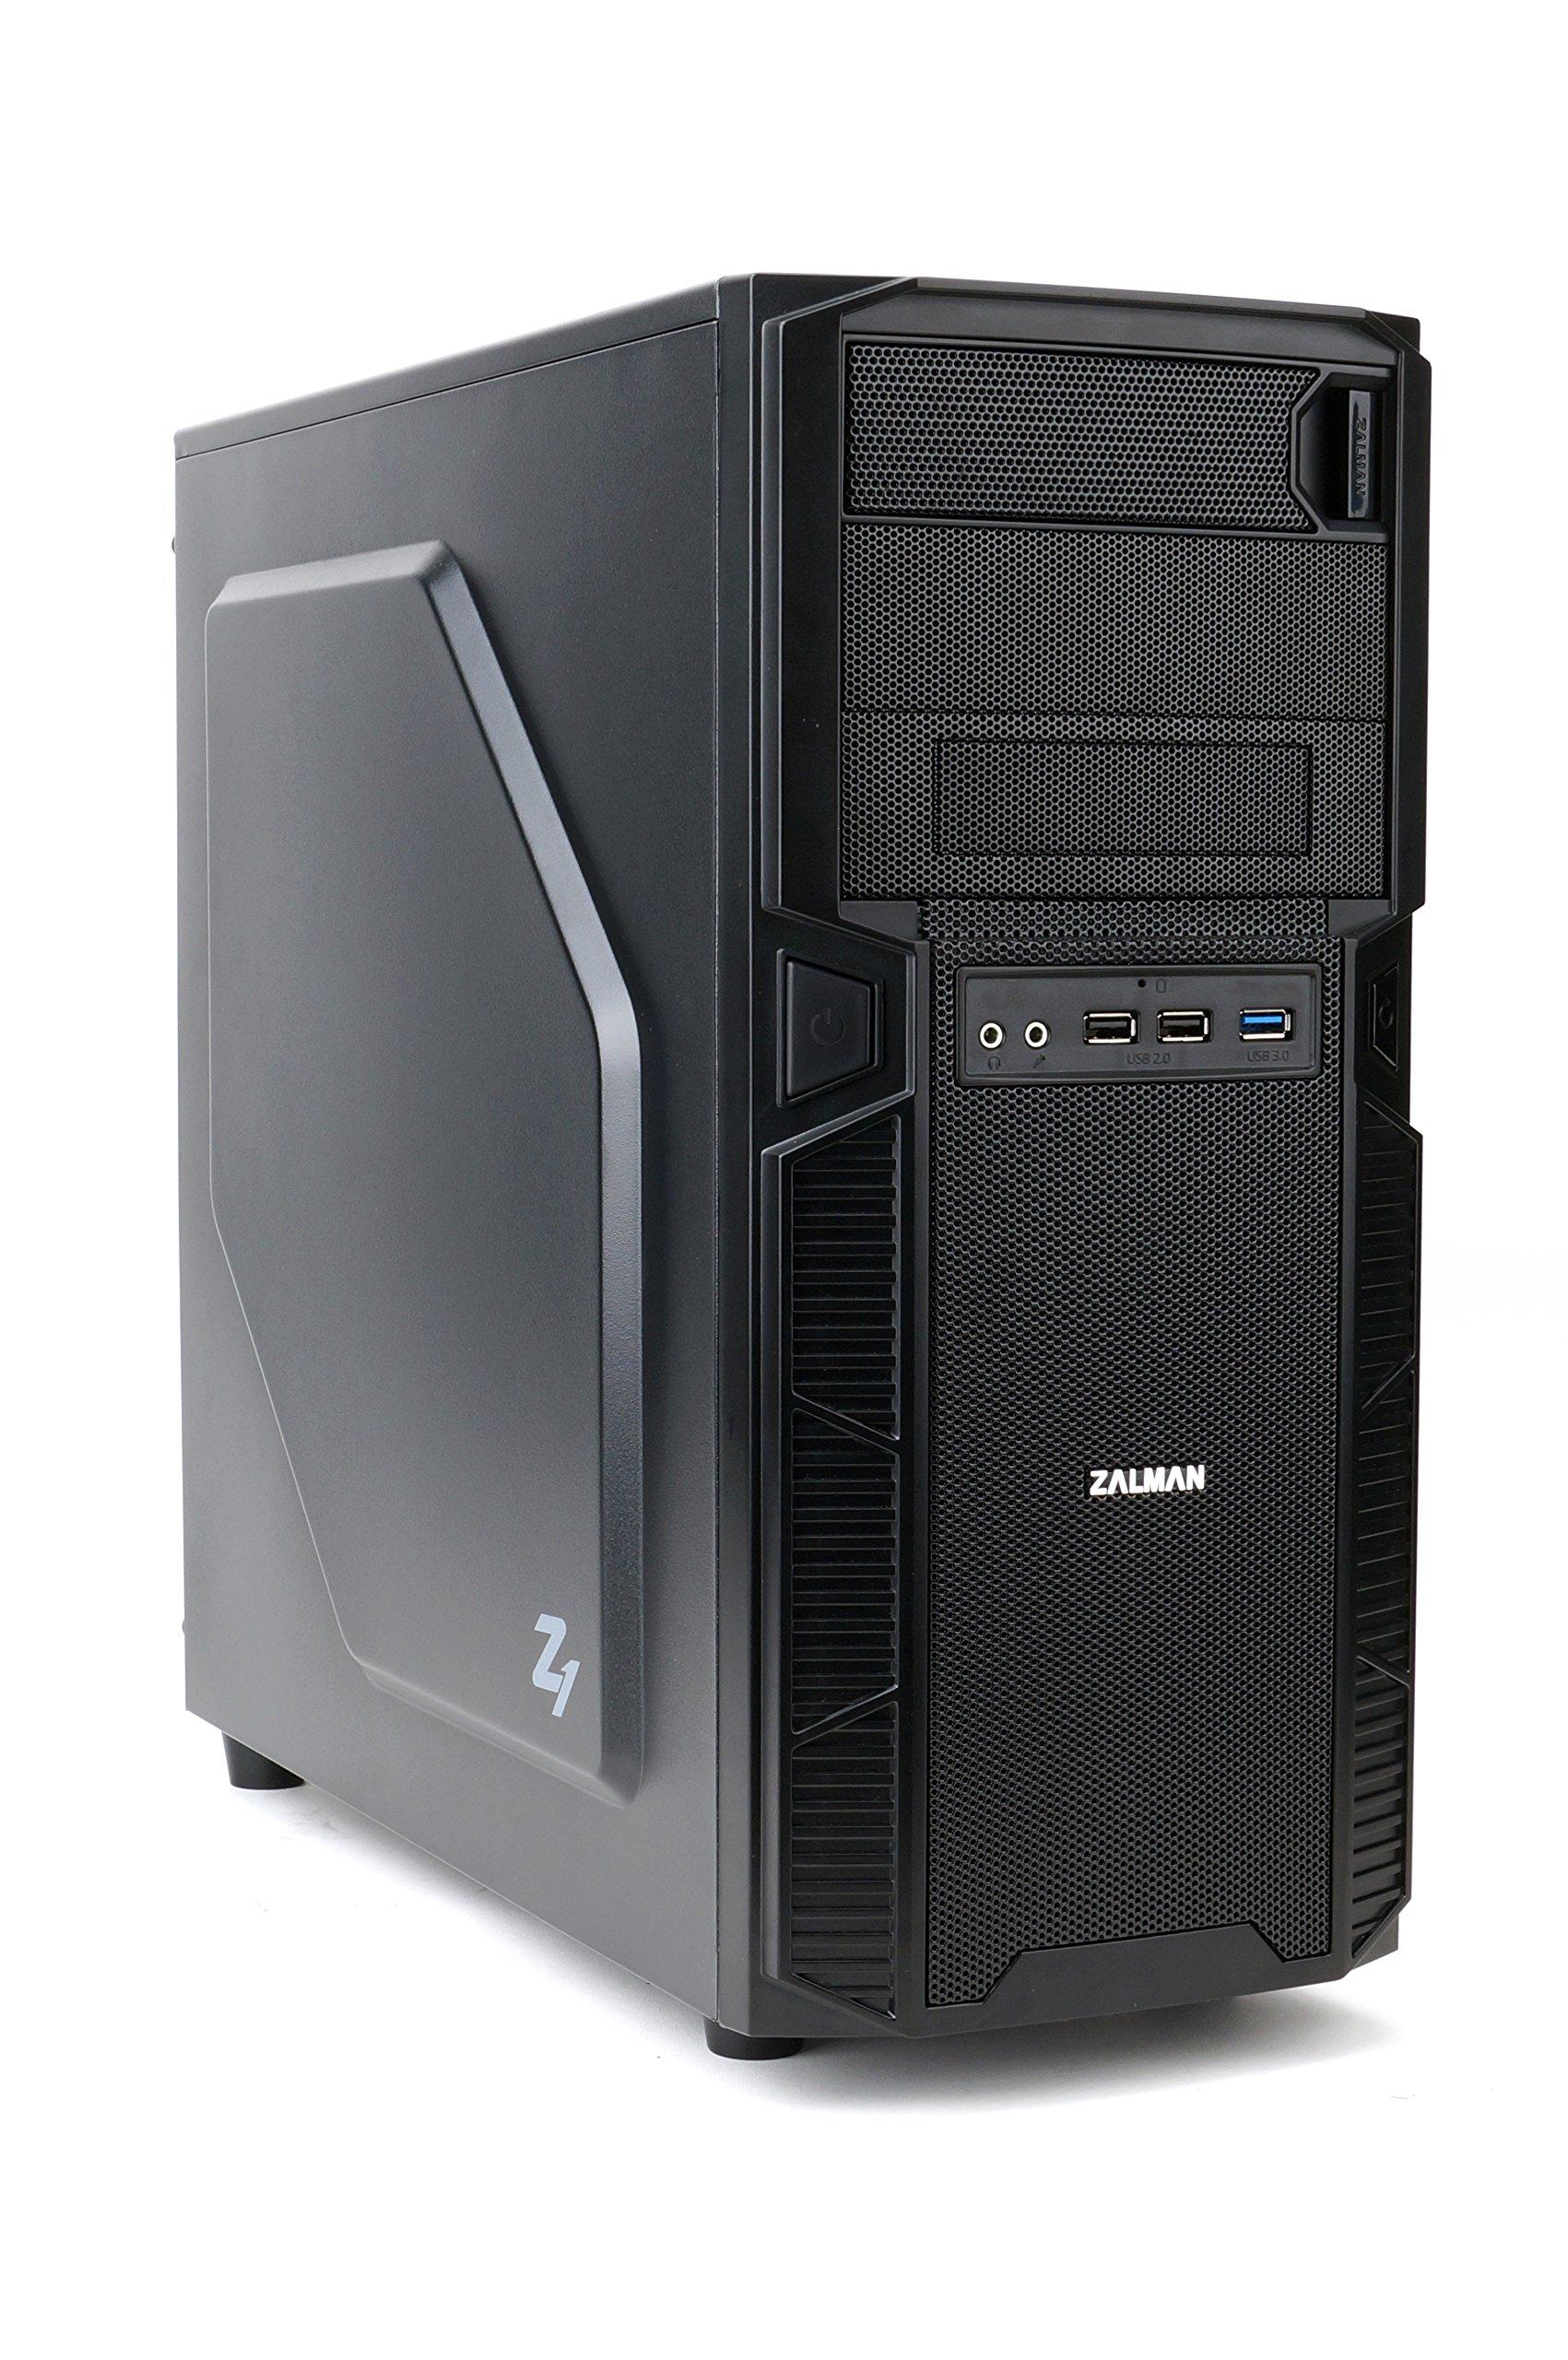 Zalman Z9 U3 ATX Mid Tower Computer Case (Black)